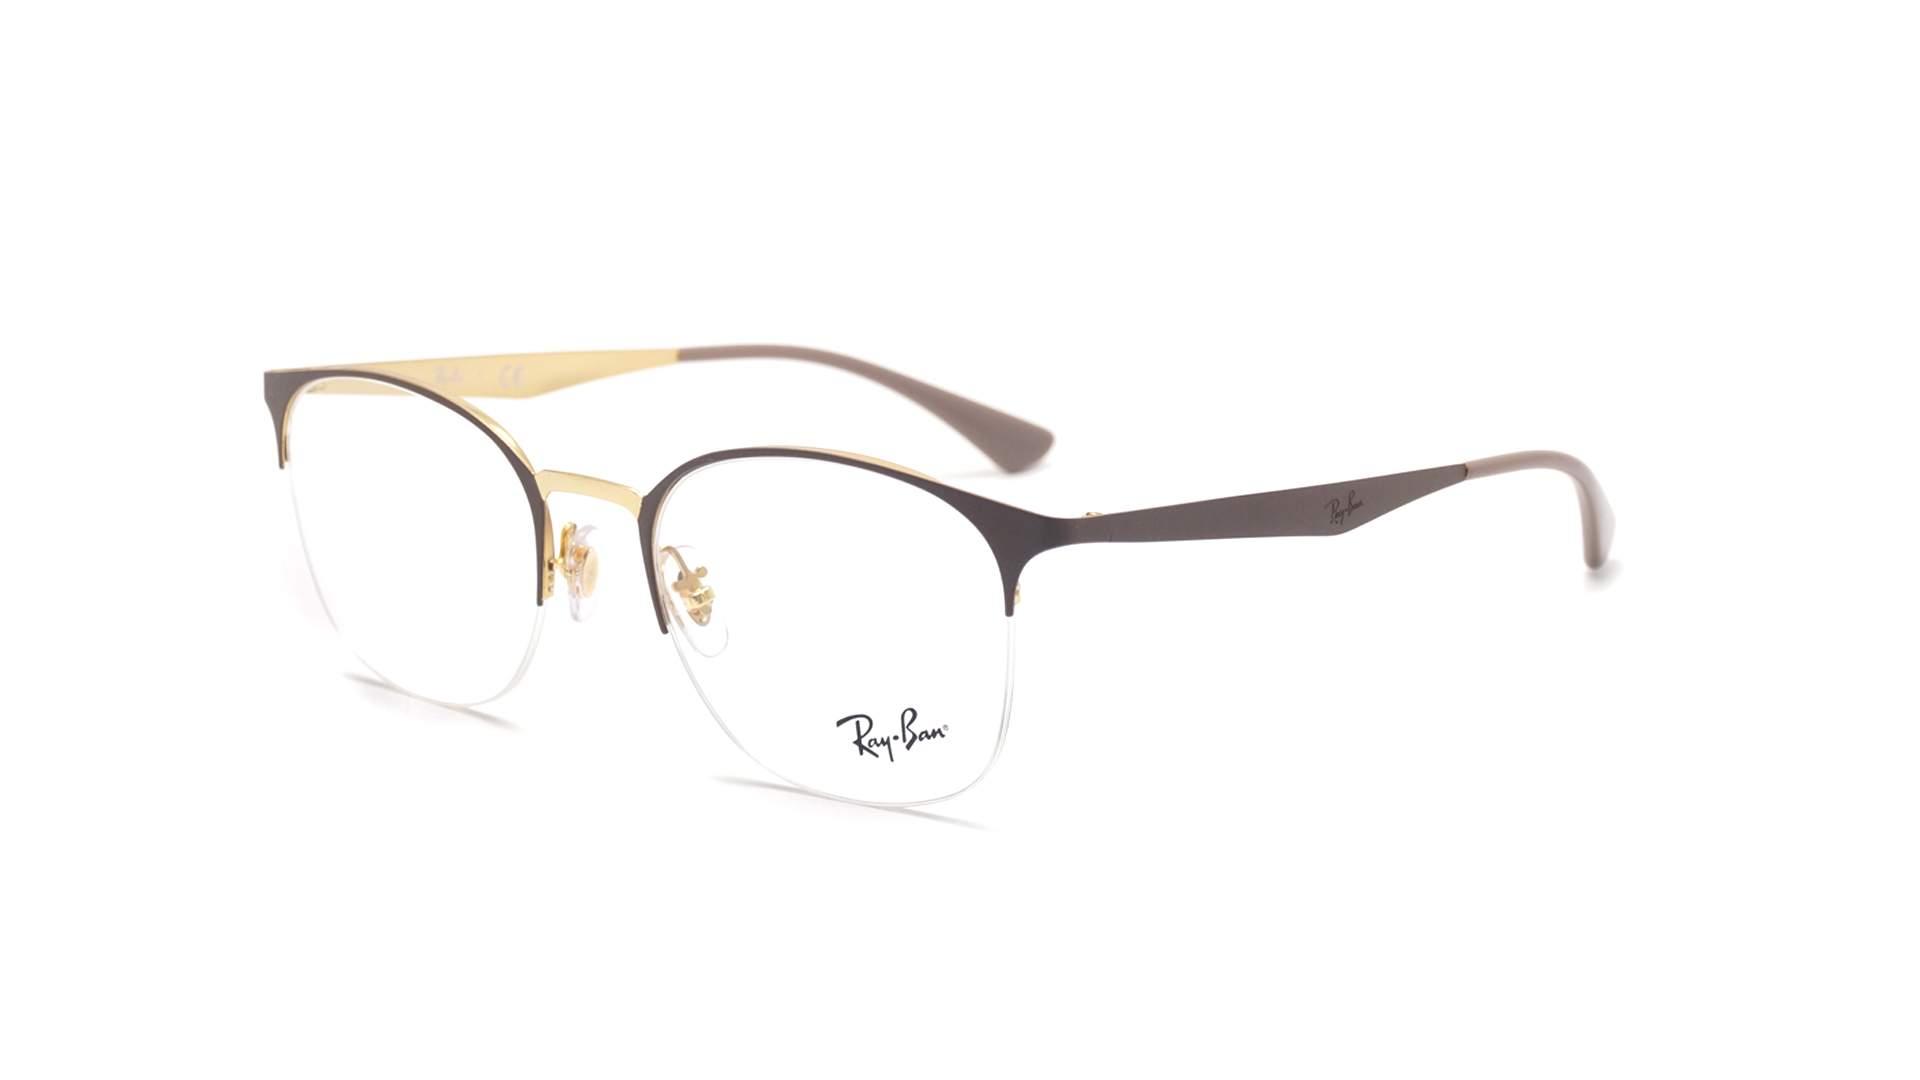 7b8e0e3a357 Eyeglasses Ray-Ban RX6422 RB6422 3005 49-19 Marron Matte Small